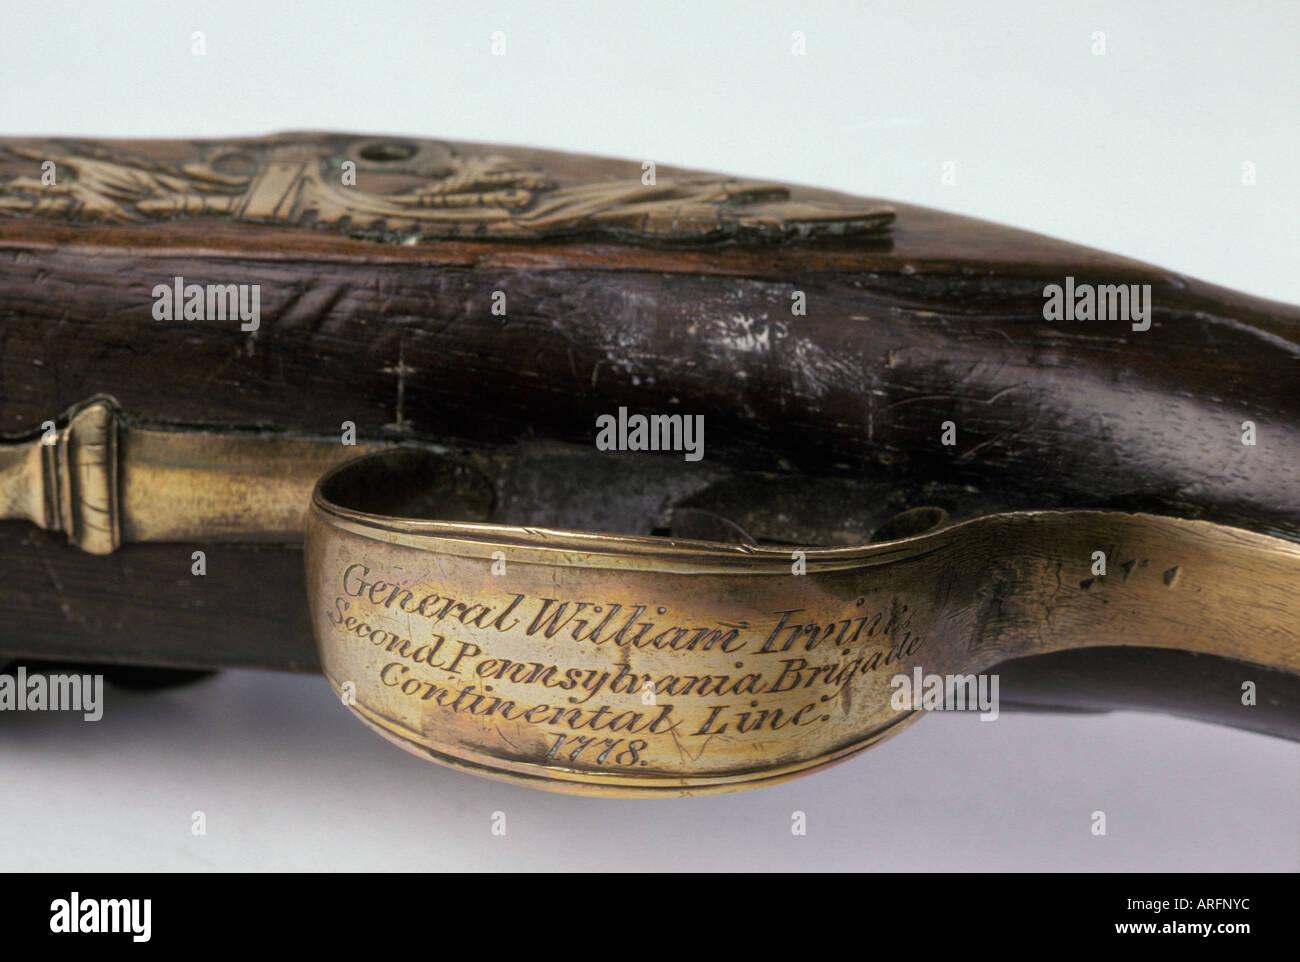 close up engraved trigger mechanism pistol revolutionary war